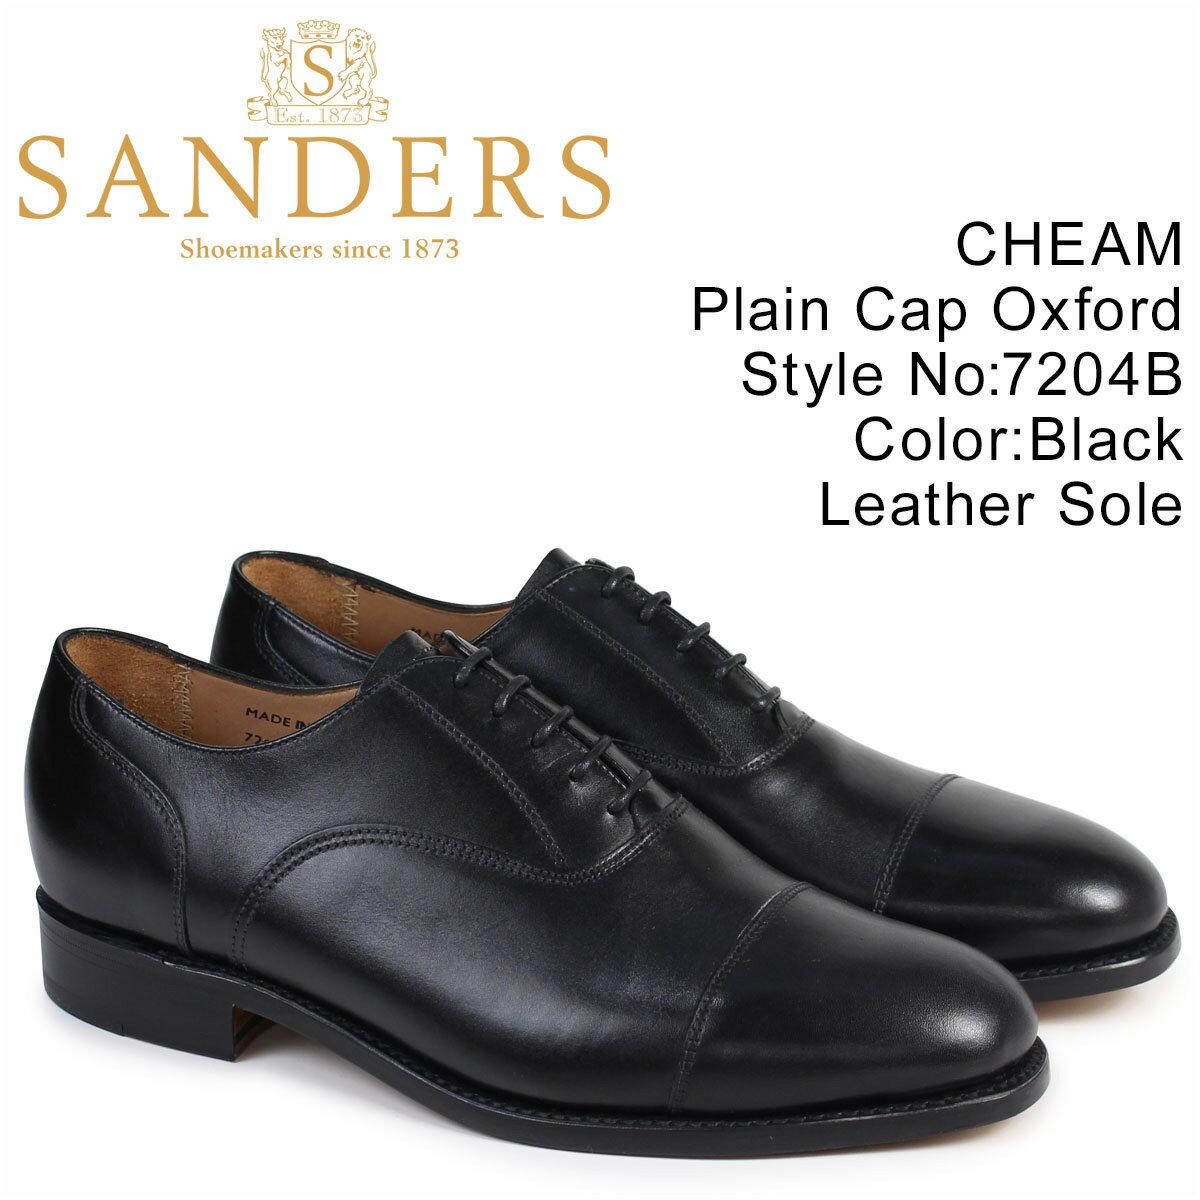 SANDERS CHEAM サンダース 靴 ミリタリー オックスフォード シューズ ビジネス 7204B メンズ ブラック